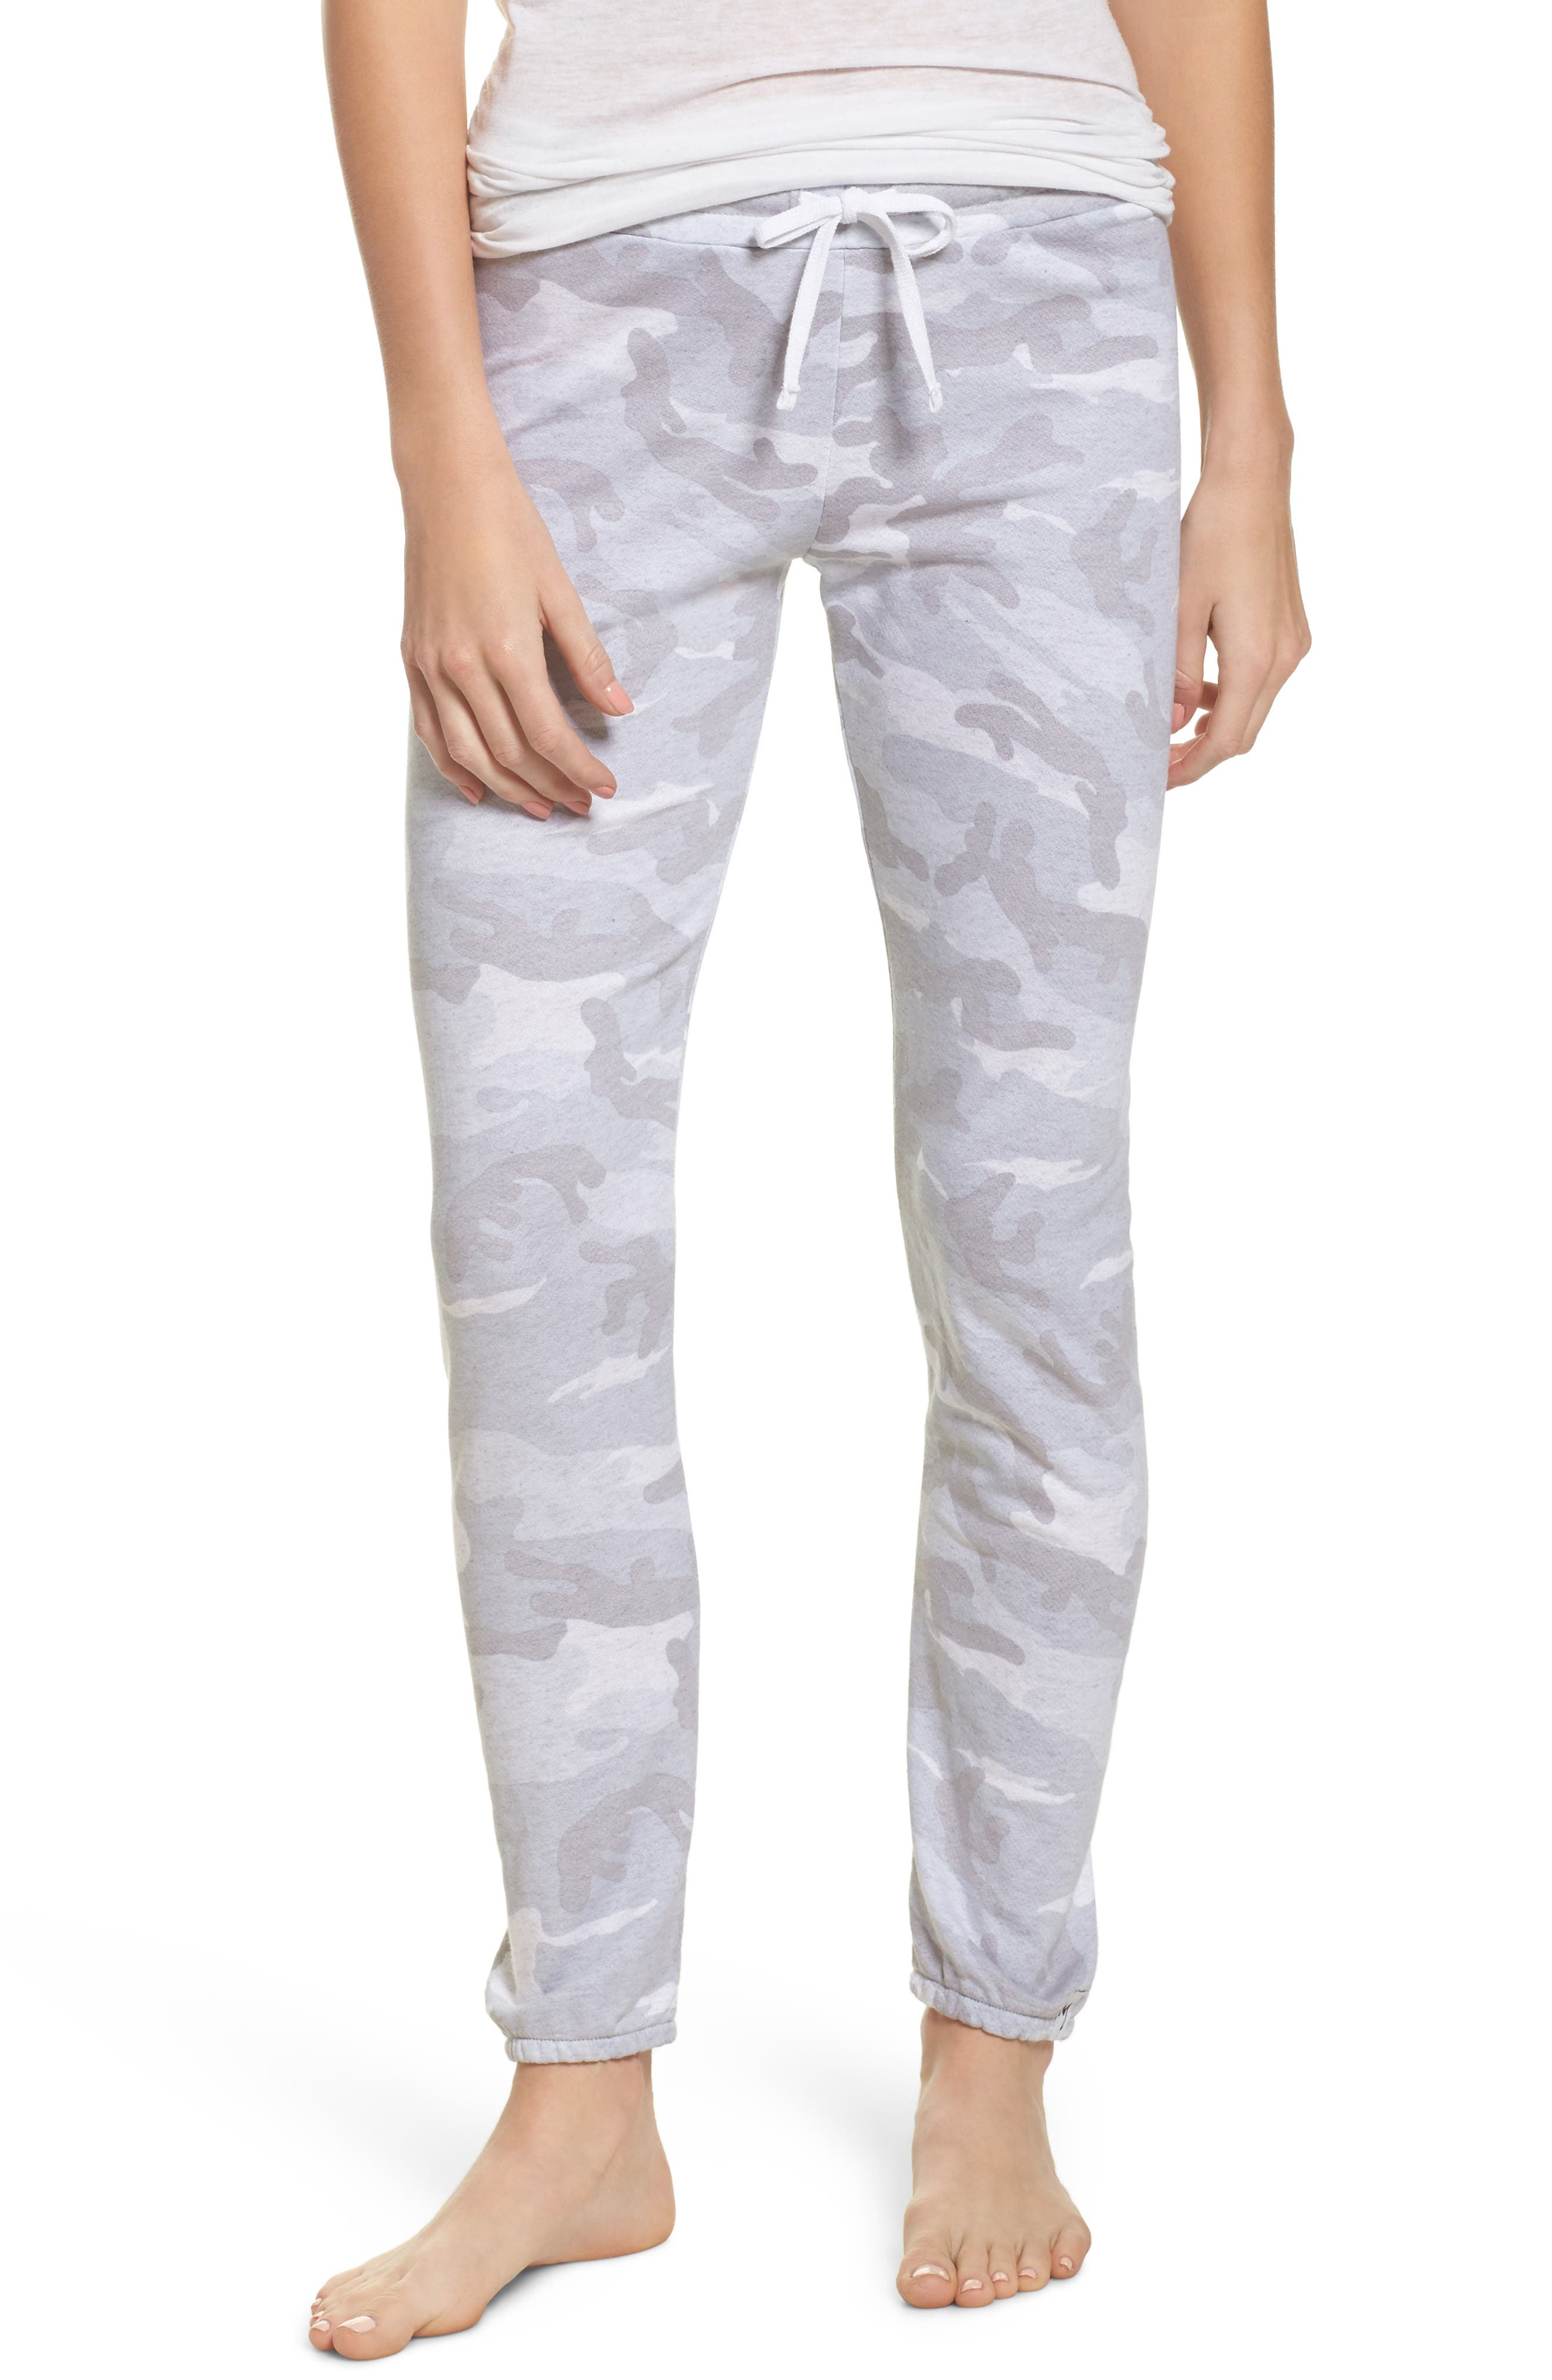 Campbell Vintage Jogger Pants,                             Main thumbnail 1, color,                             Light Grey Camo